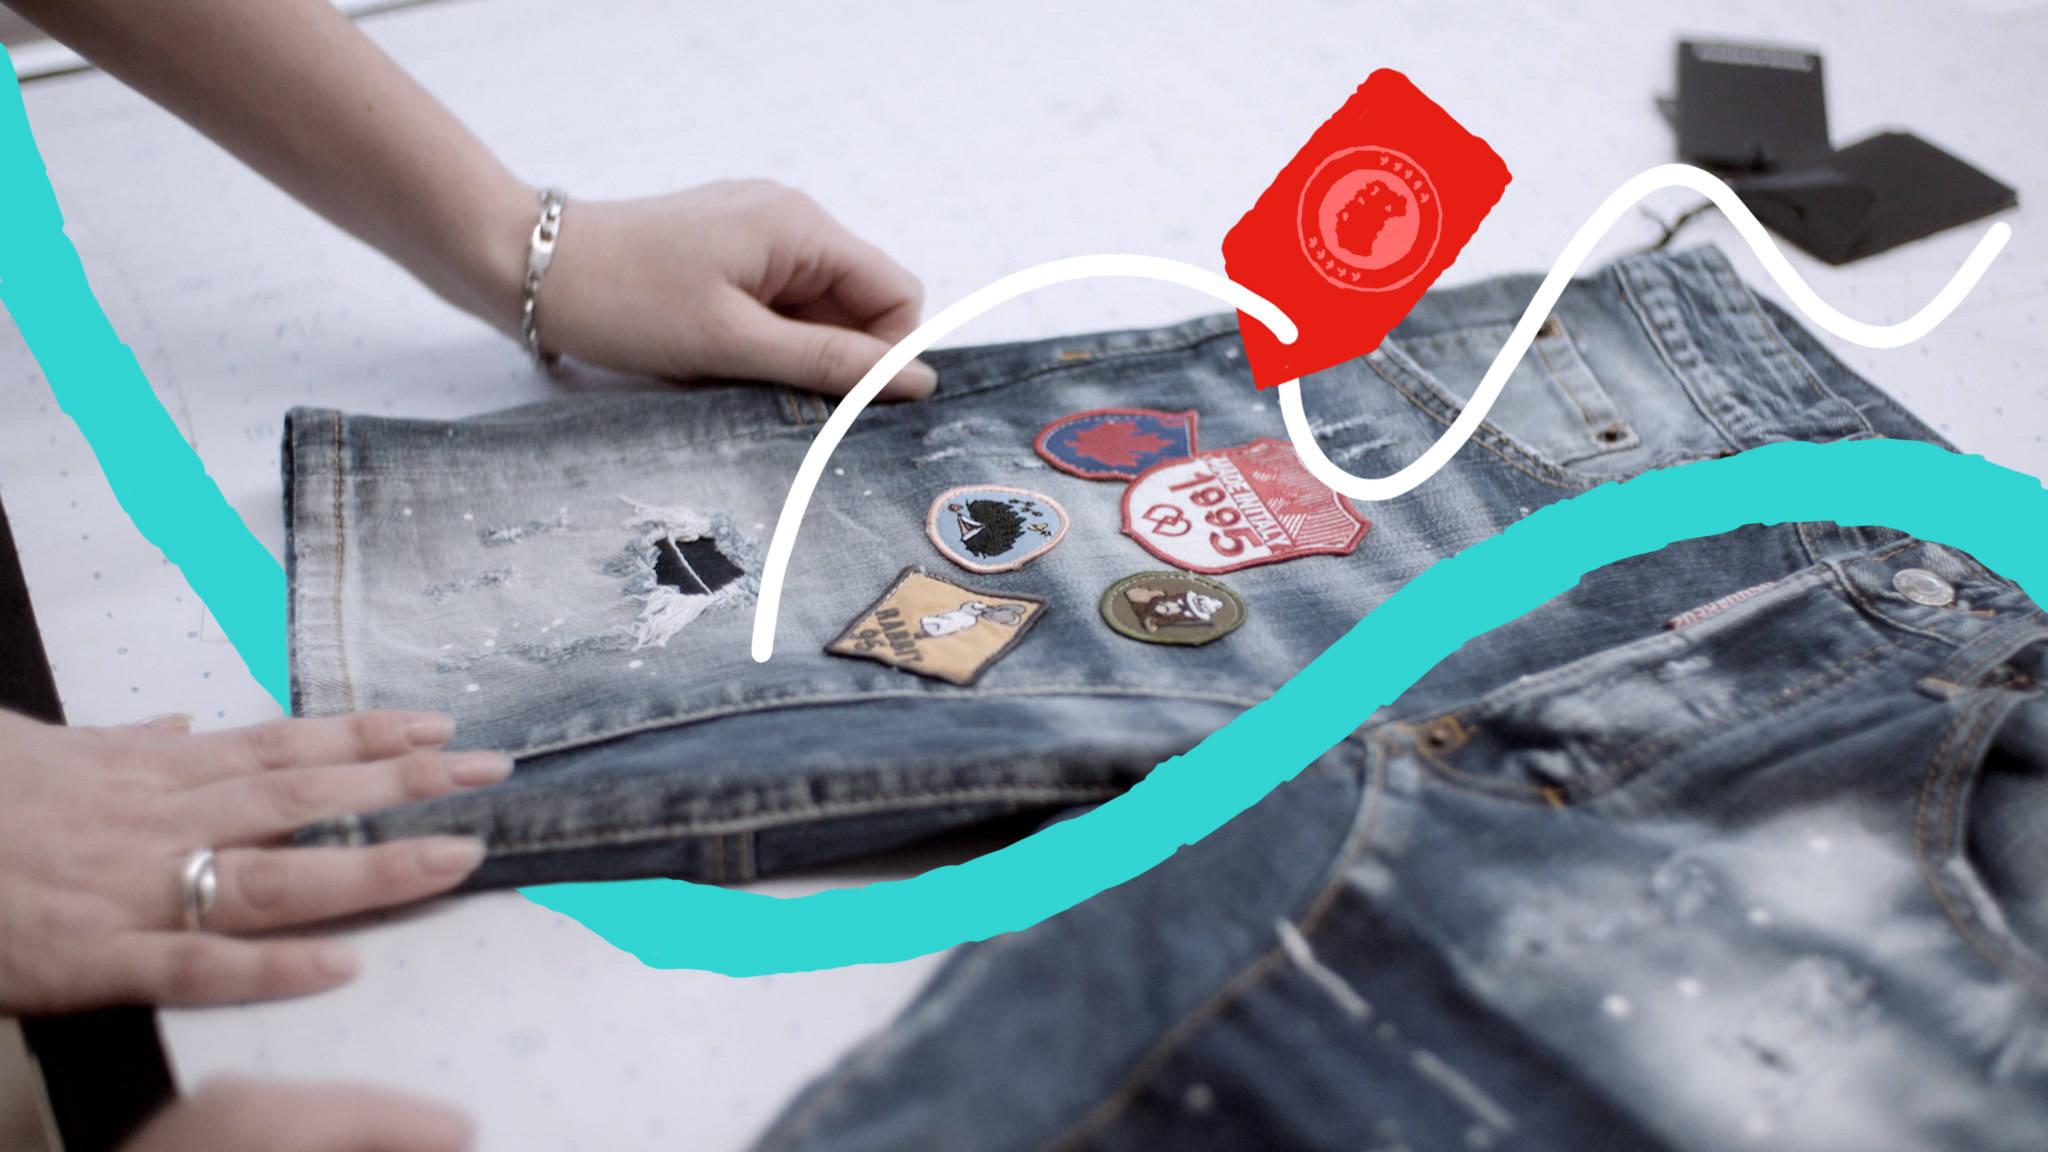 eb963a6d0ba Instagram verwijdert 2000 accounts die nepmerkkleding verkopen   NOS